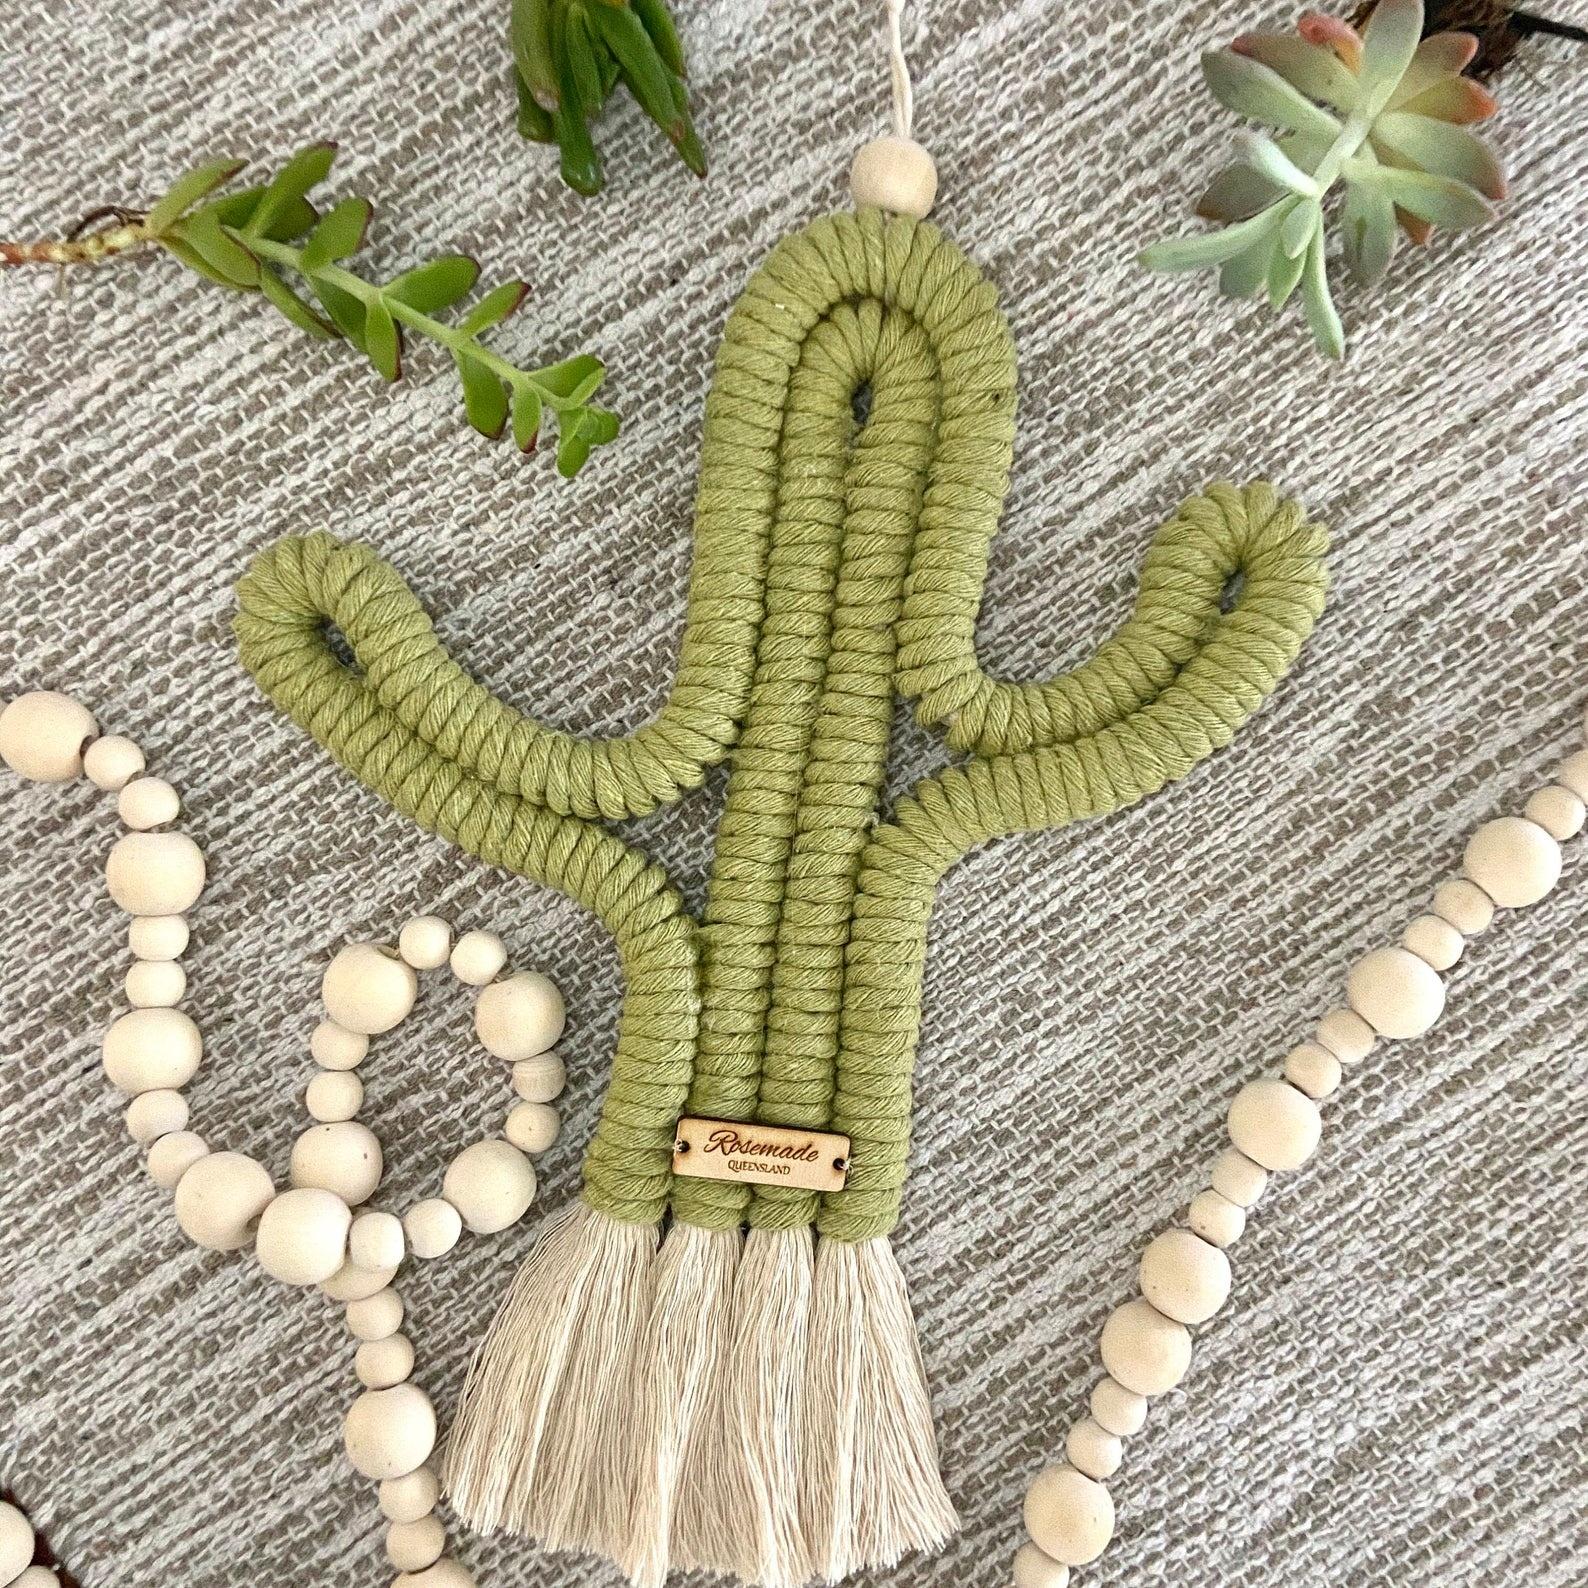 Rosemade Fibre Arts Cactus Kit